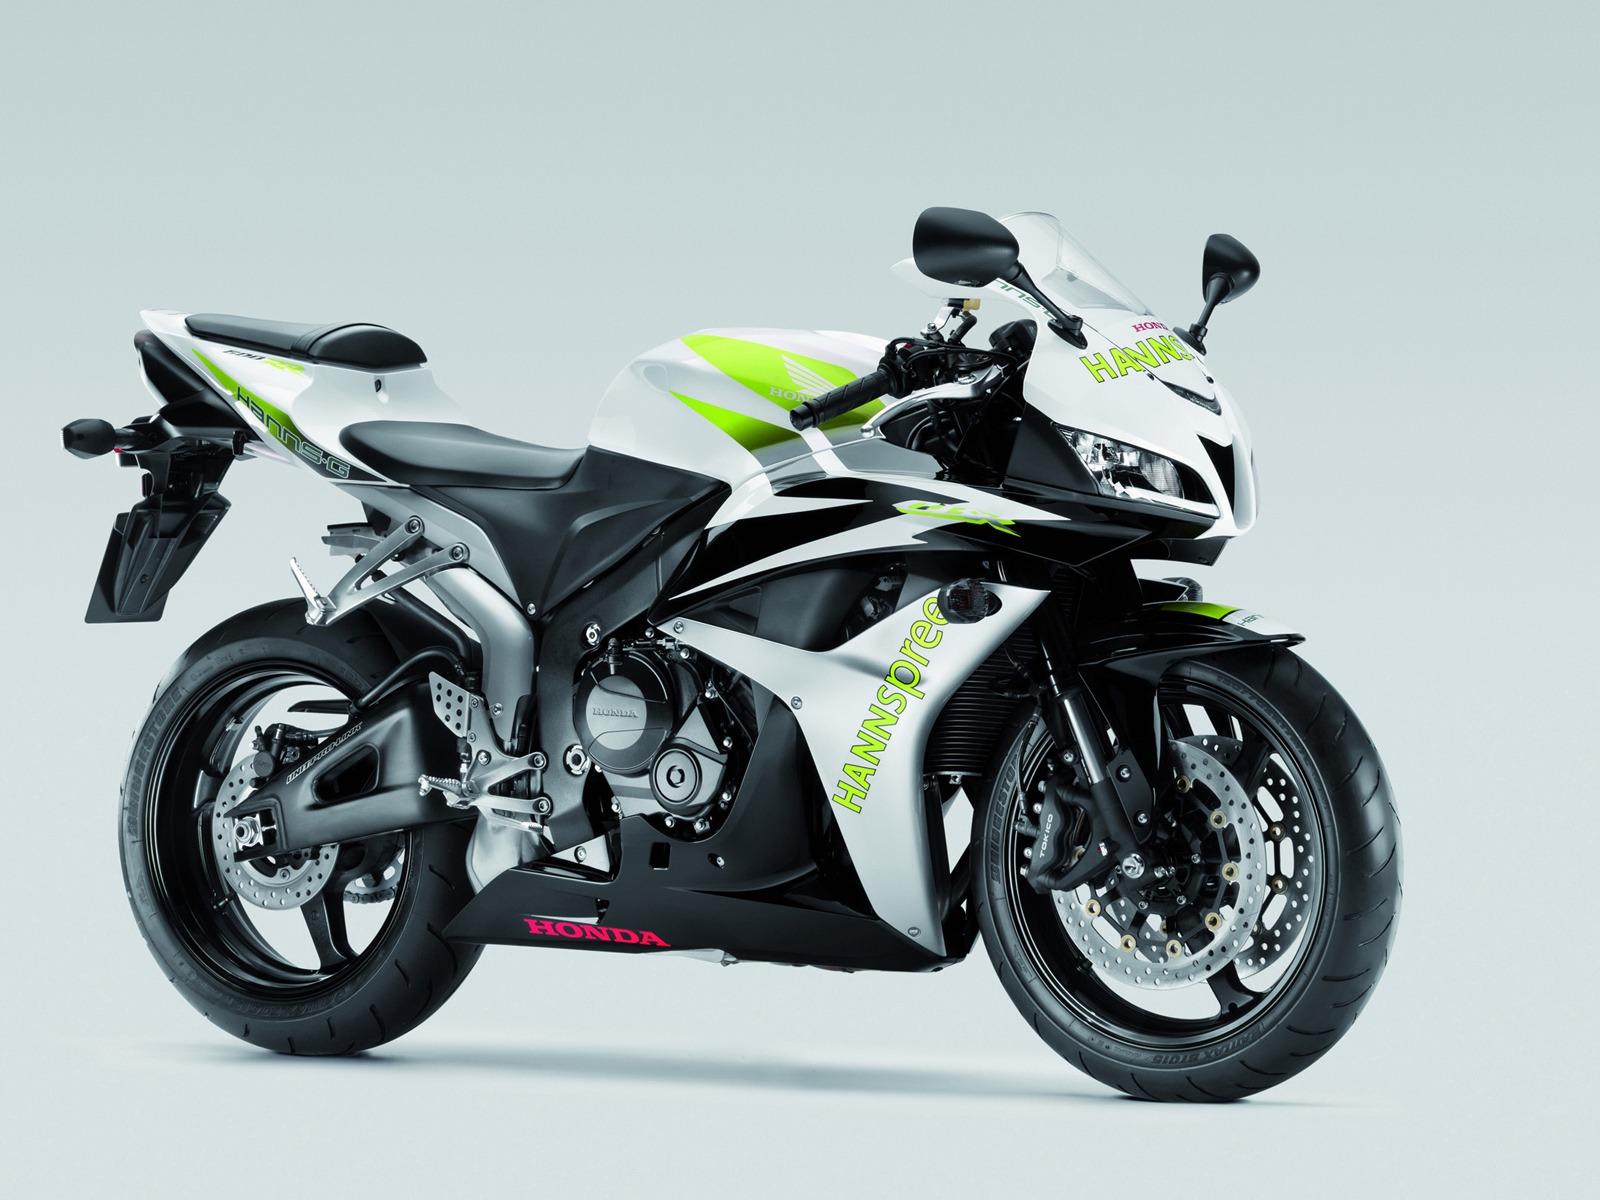 http://1.bp.blogspot.com/-X4K0lVASbXg/Tn04JWmXHjI/AAAAAAAABiA/R_aad0SBIQ8/s1600/Honda-CBR-600-RR-2011-Images-White-Green.jpg